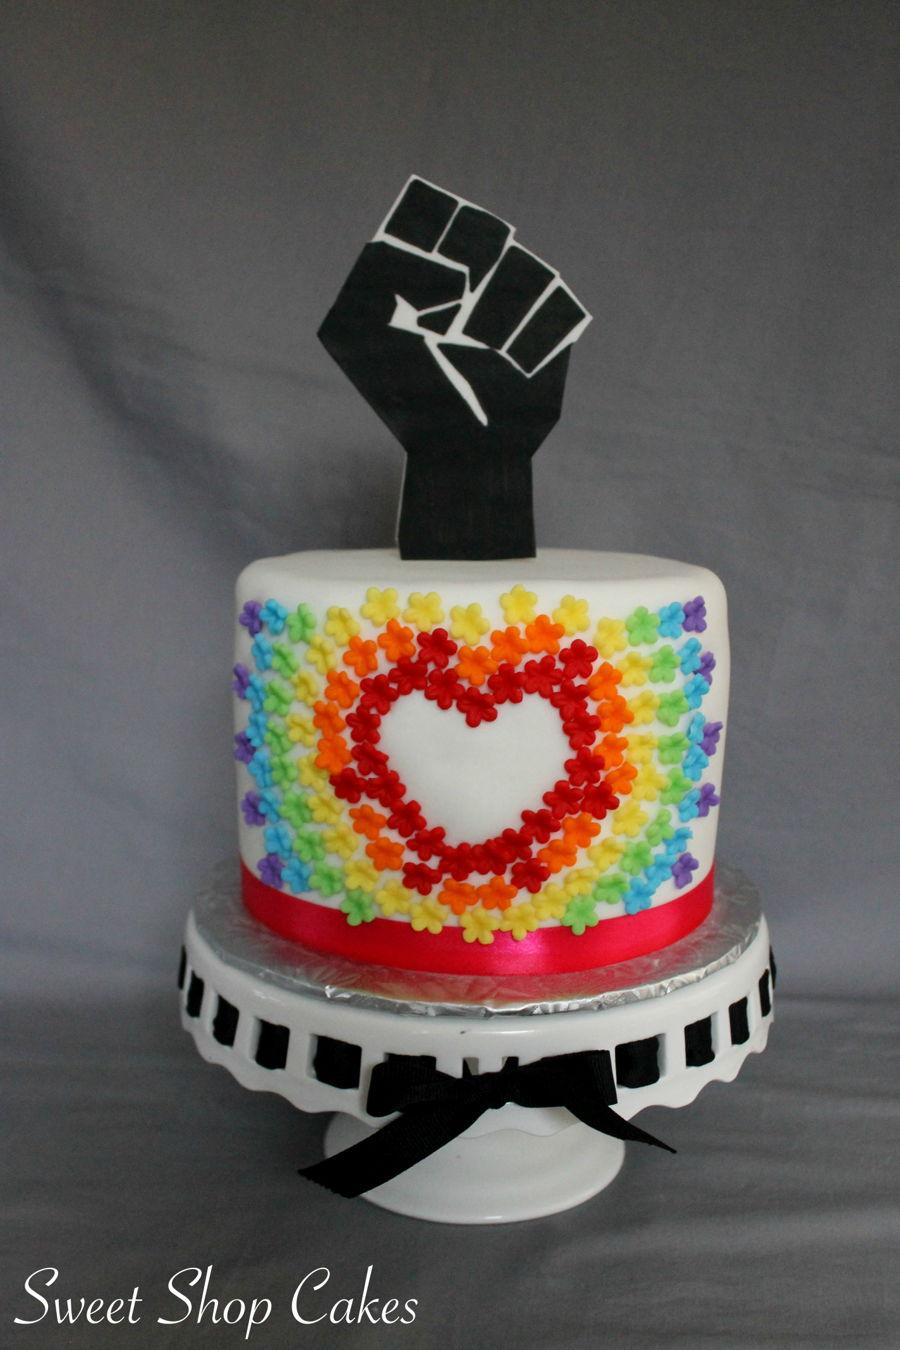 900_contest-cake-937512ZFRFE.jpg